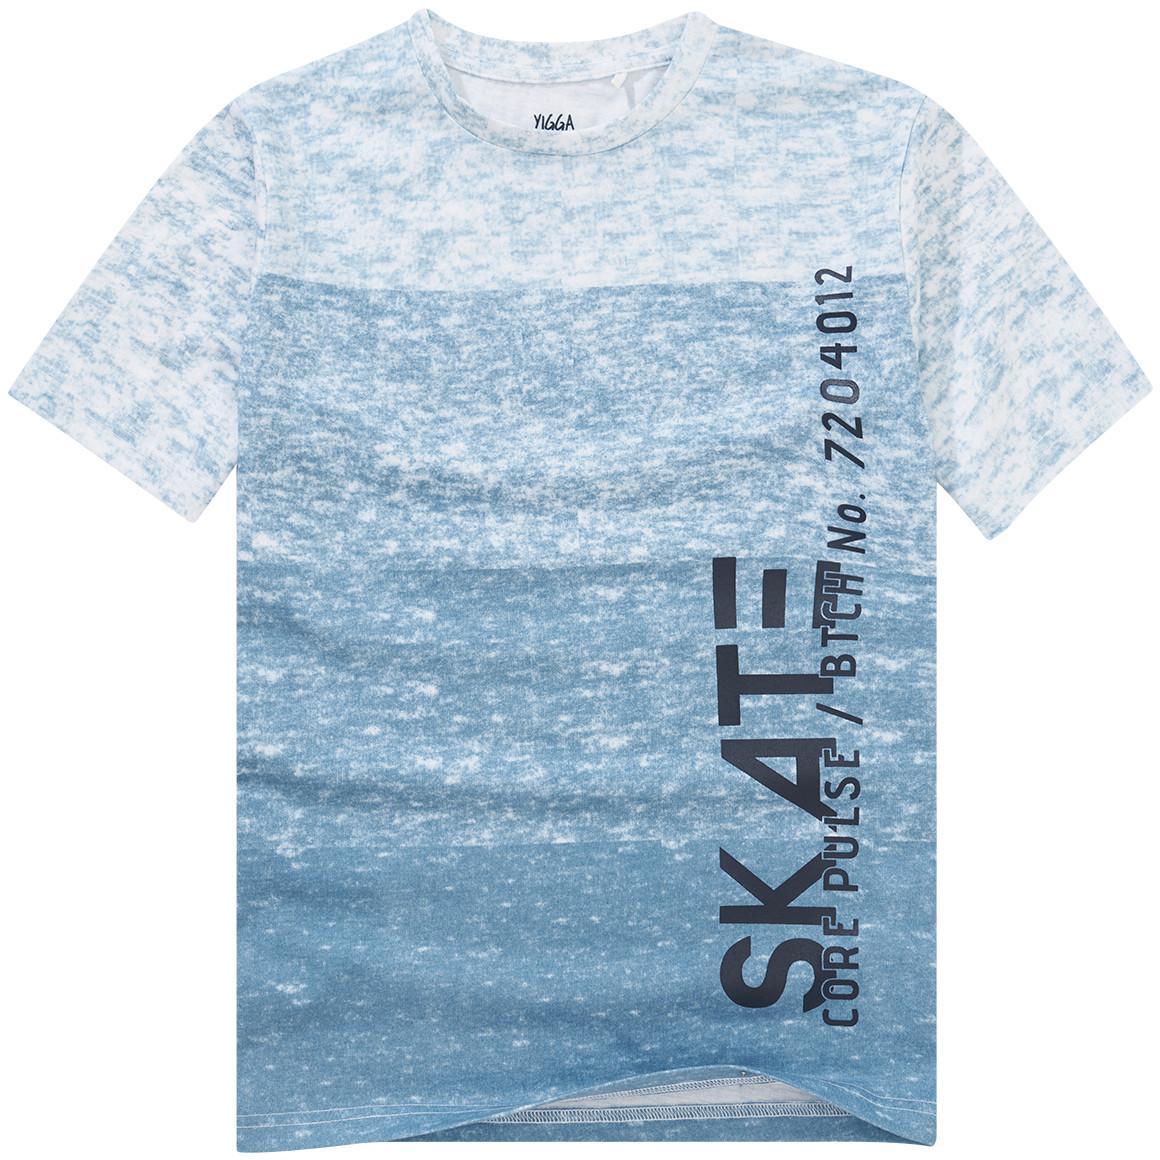 Jungen T-Shirt mit Panel Print